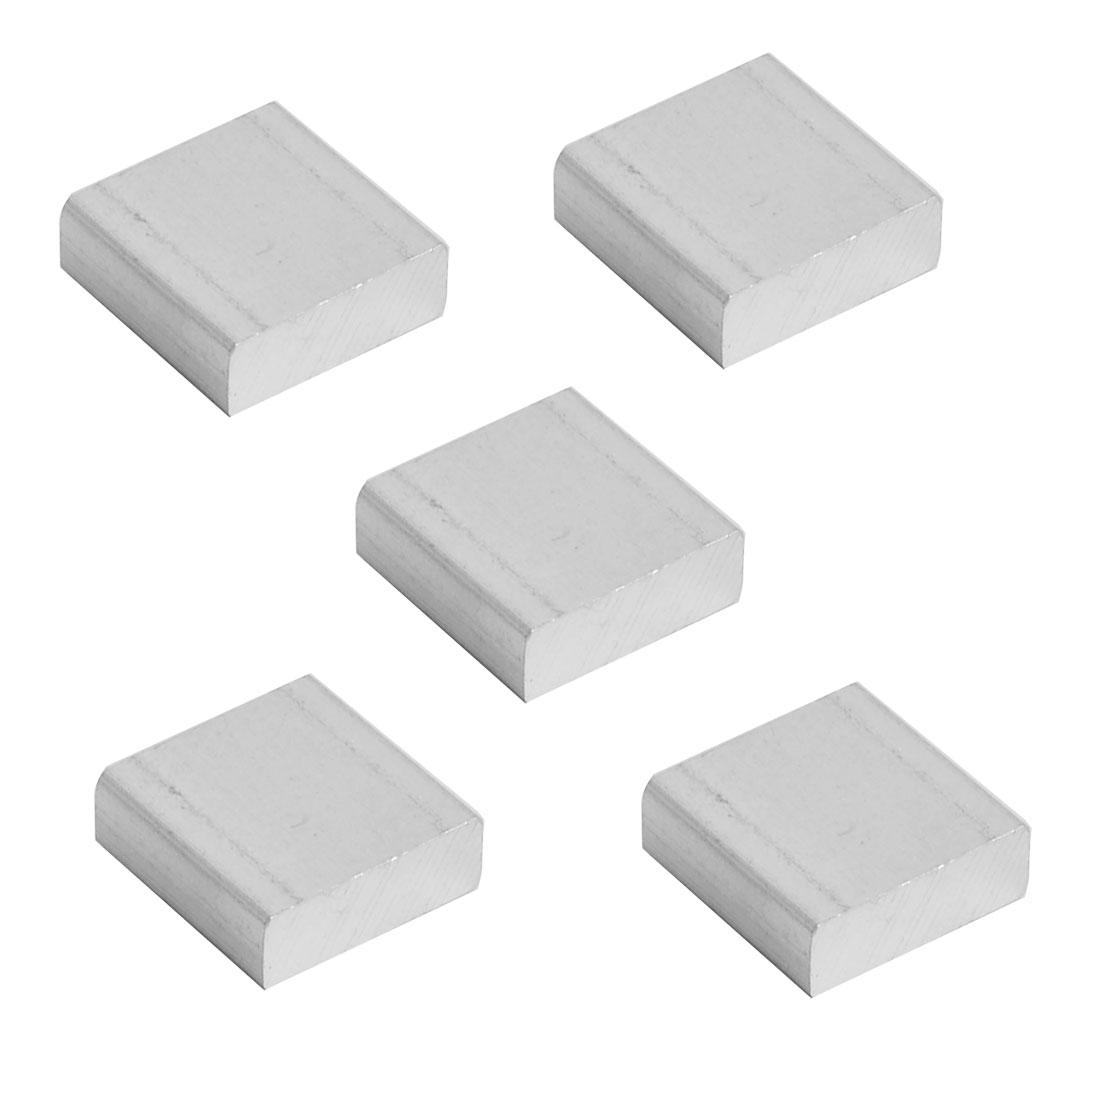 Aluminium Heatsink Cooling Fin Cooler Silver Tone 15mm x 15mm x 5mm 5 Pcs